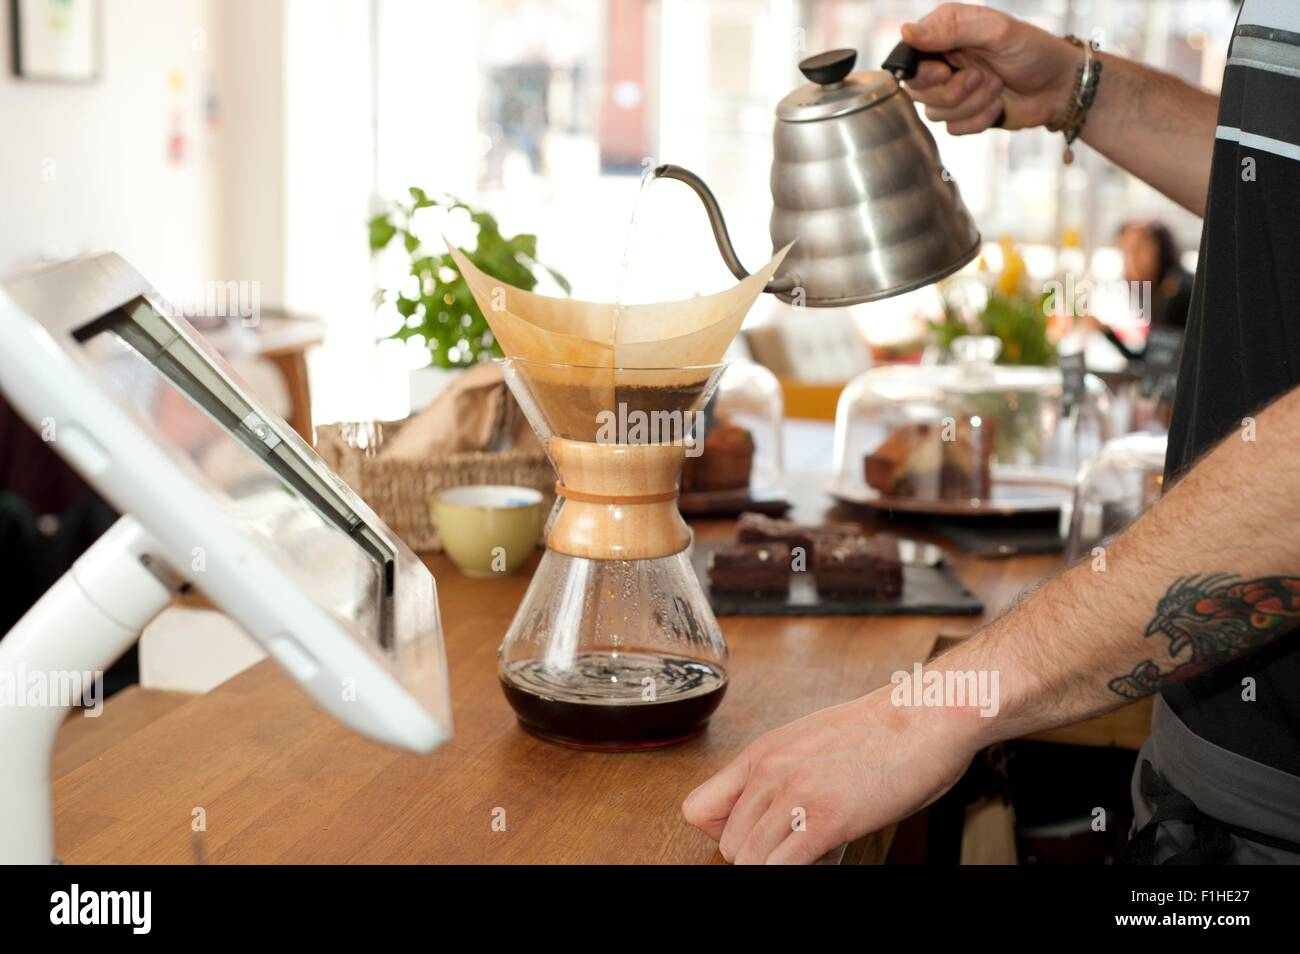 Händen des Café Kellner gießt kochendes Wasser in Topf Filterkaffee Stockbild